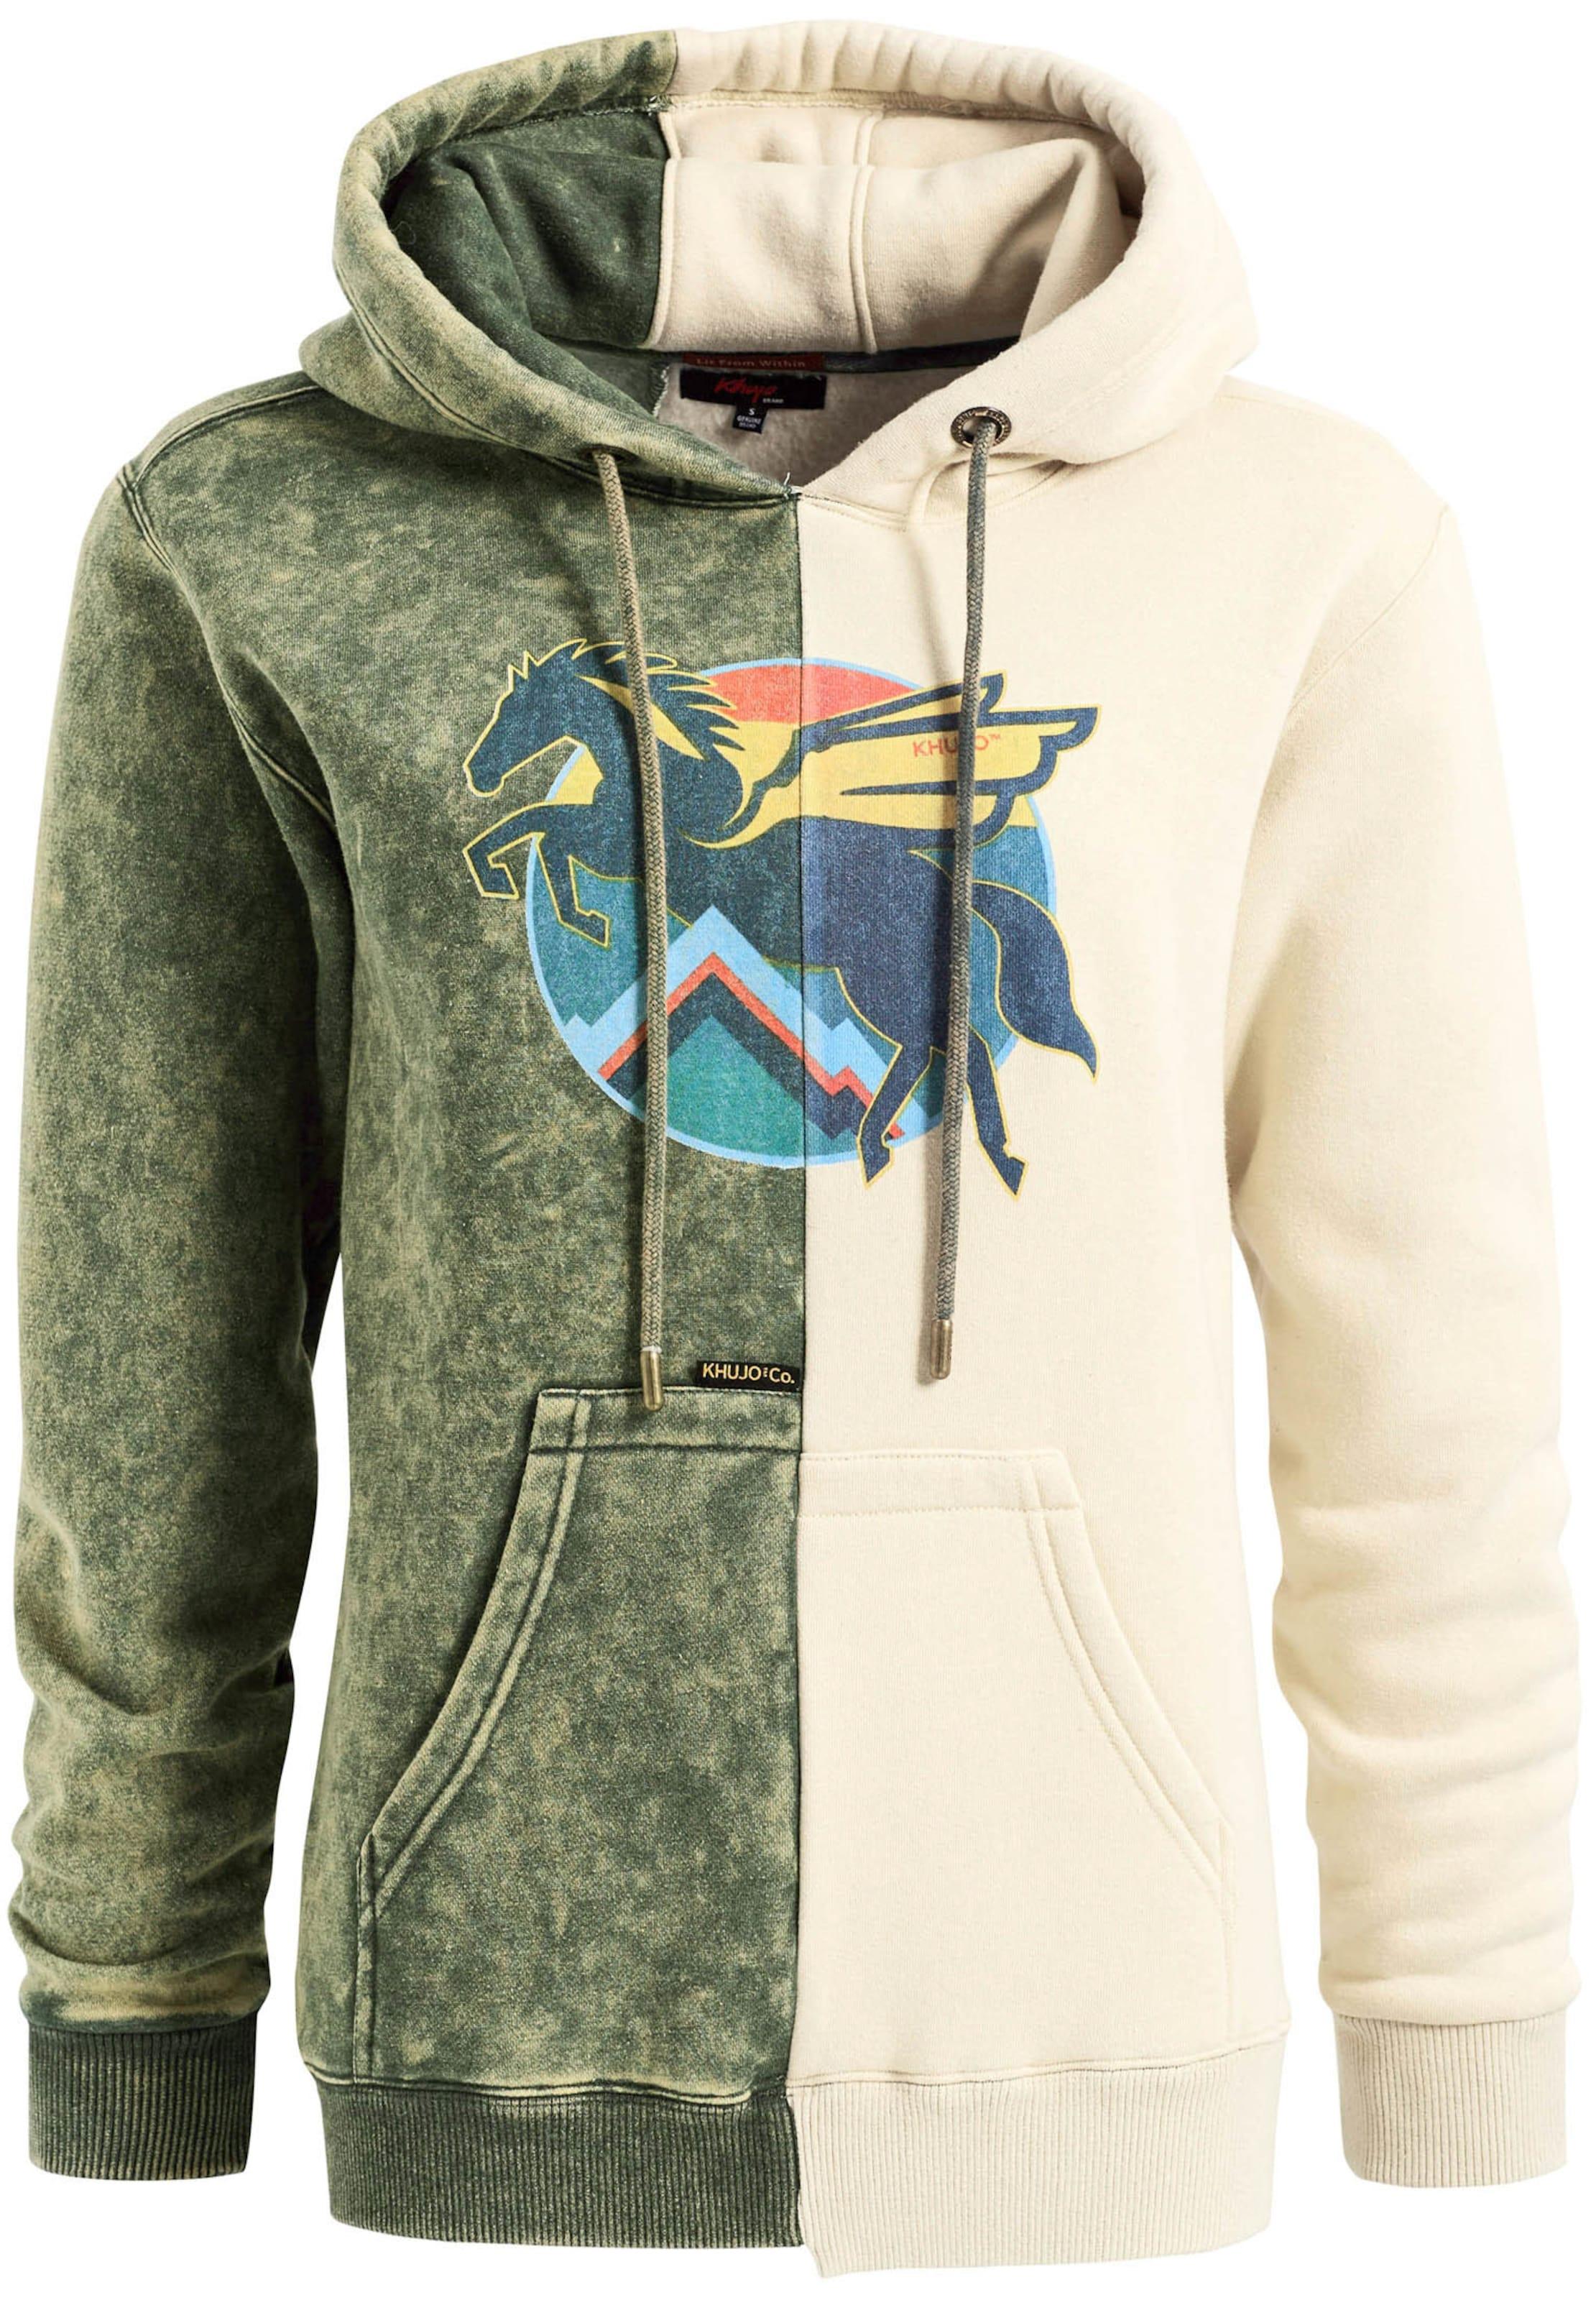 Hellgelb In Sweatshirt Horse' Türkis Khujo Koralle 'hestia CremeNavy Tanne Ybv6gI7yf